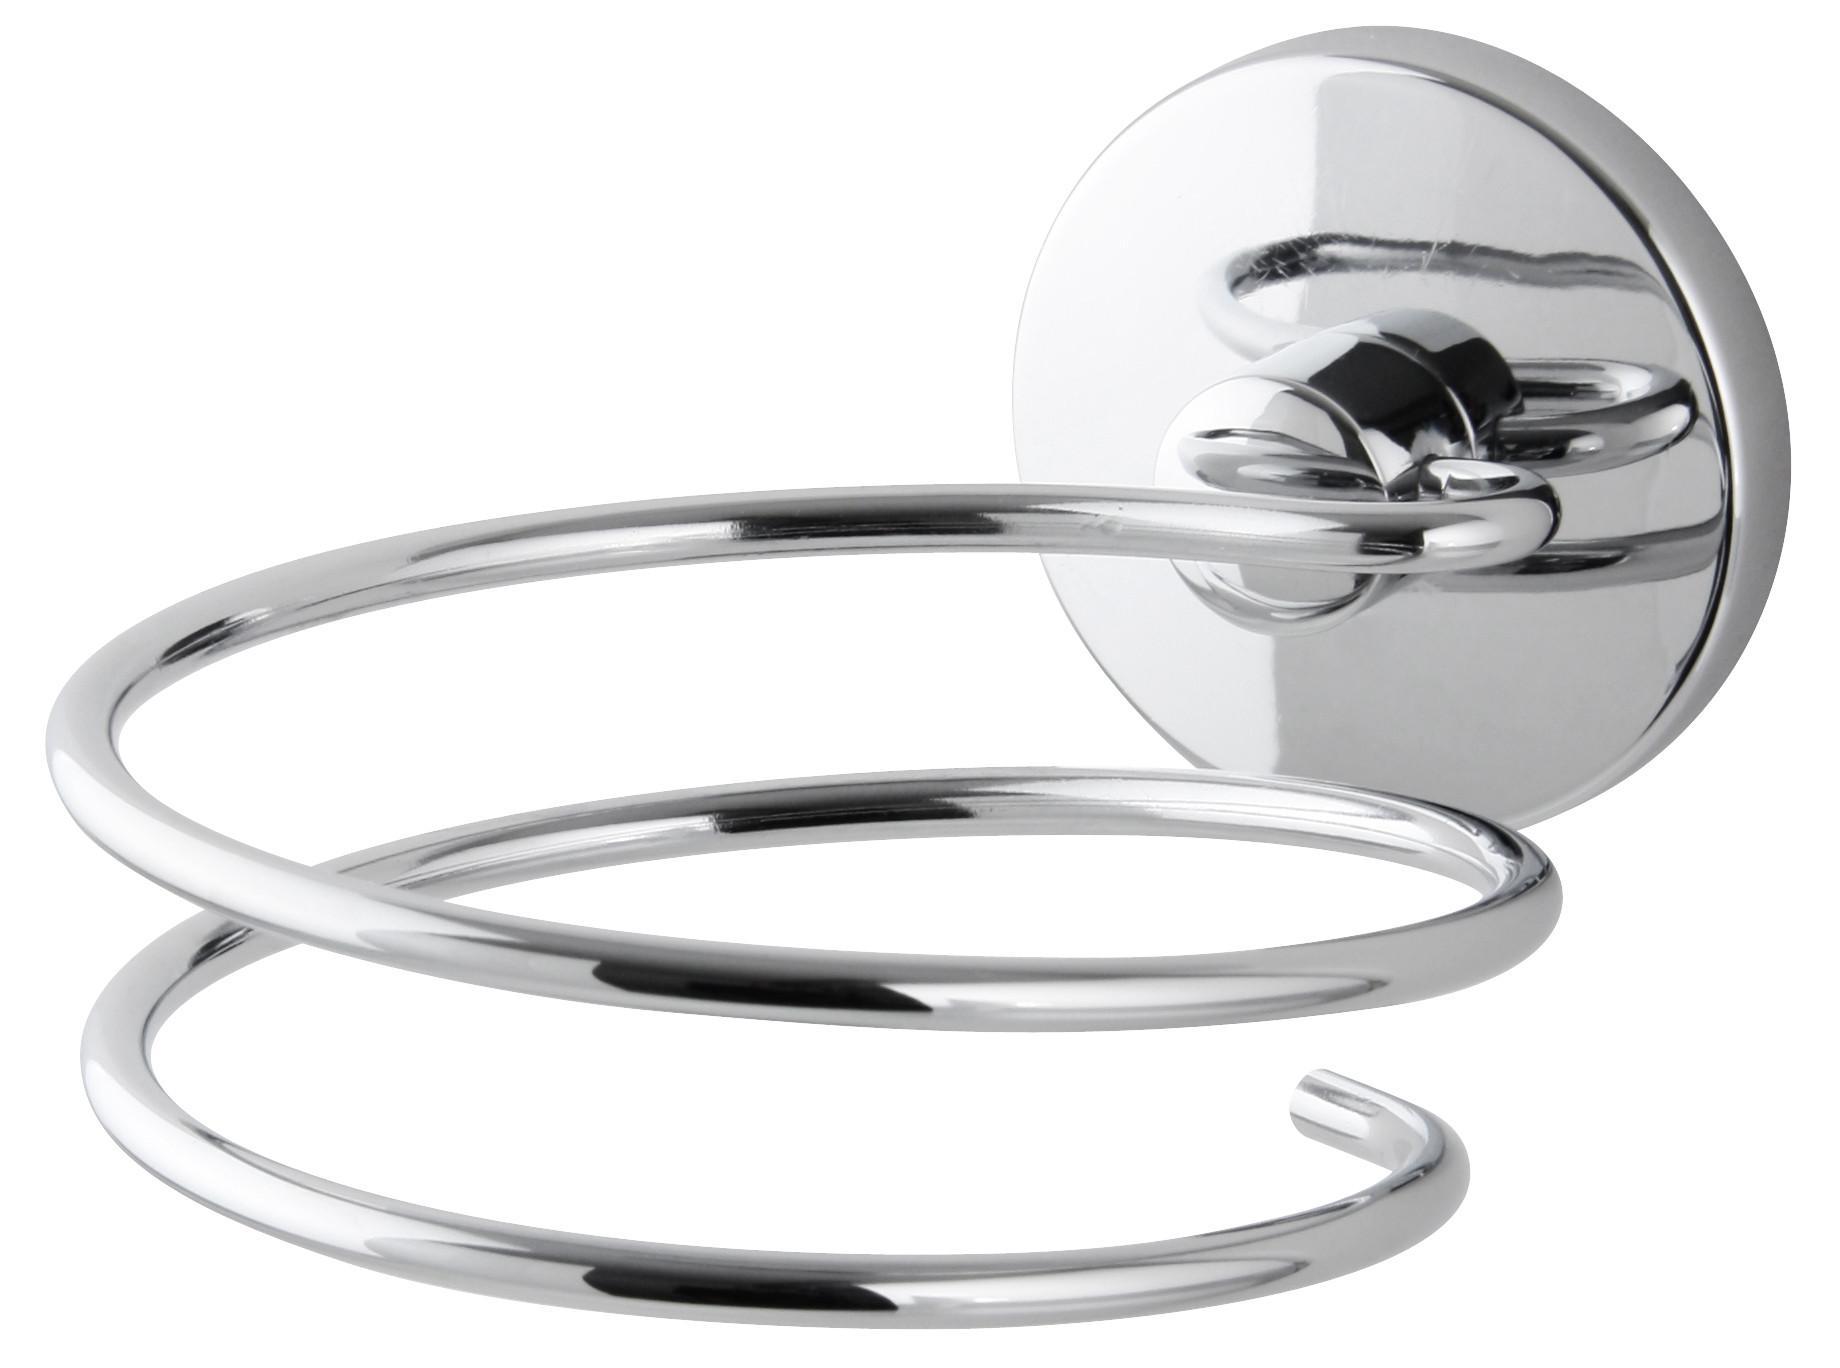 Haartrocknerhalter Vision in Chrom - Chromfarben, Metall (10/8/13cm) - MÖMAX modern living